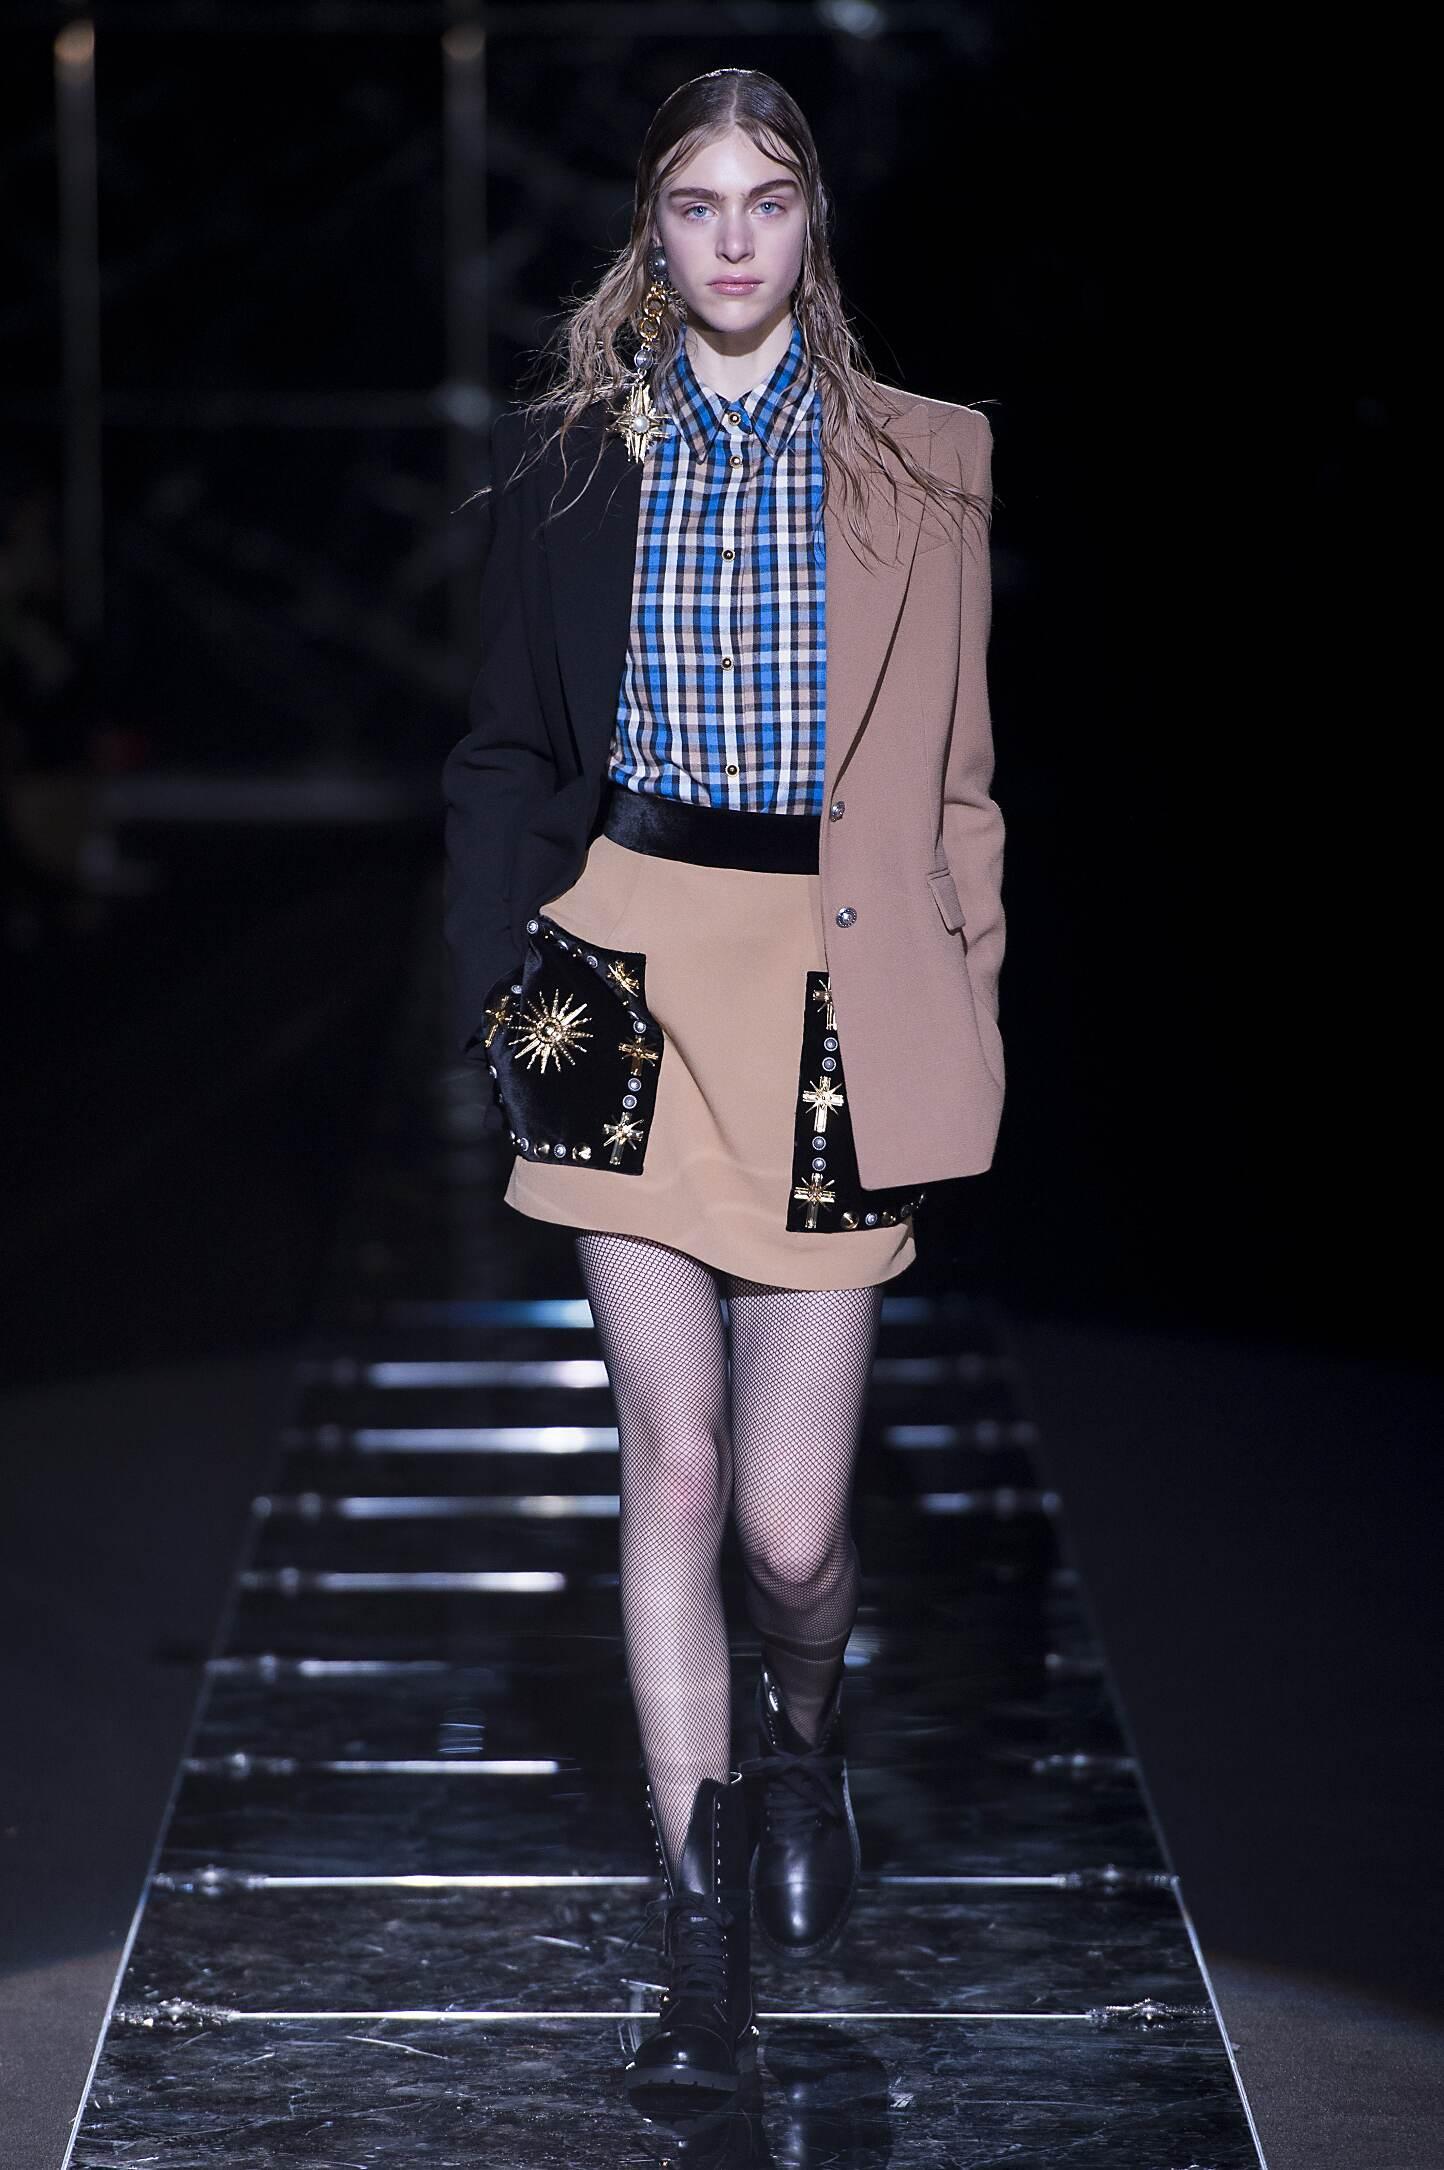 Fausto Puglisi Collection Fashion Trends